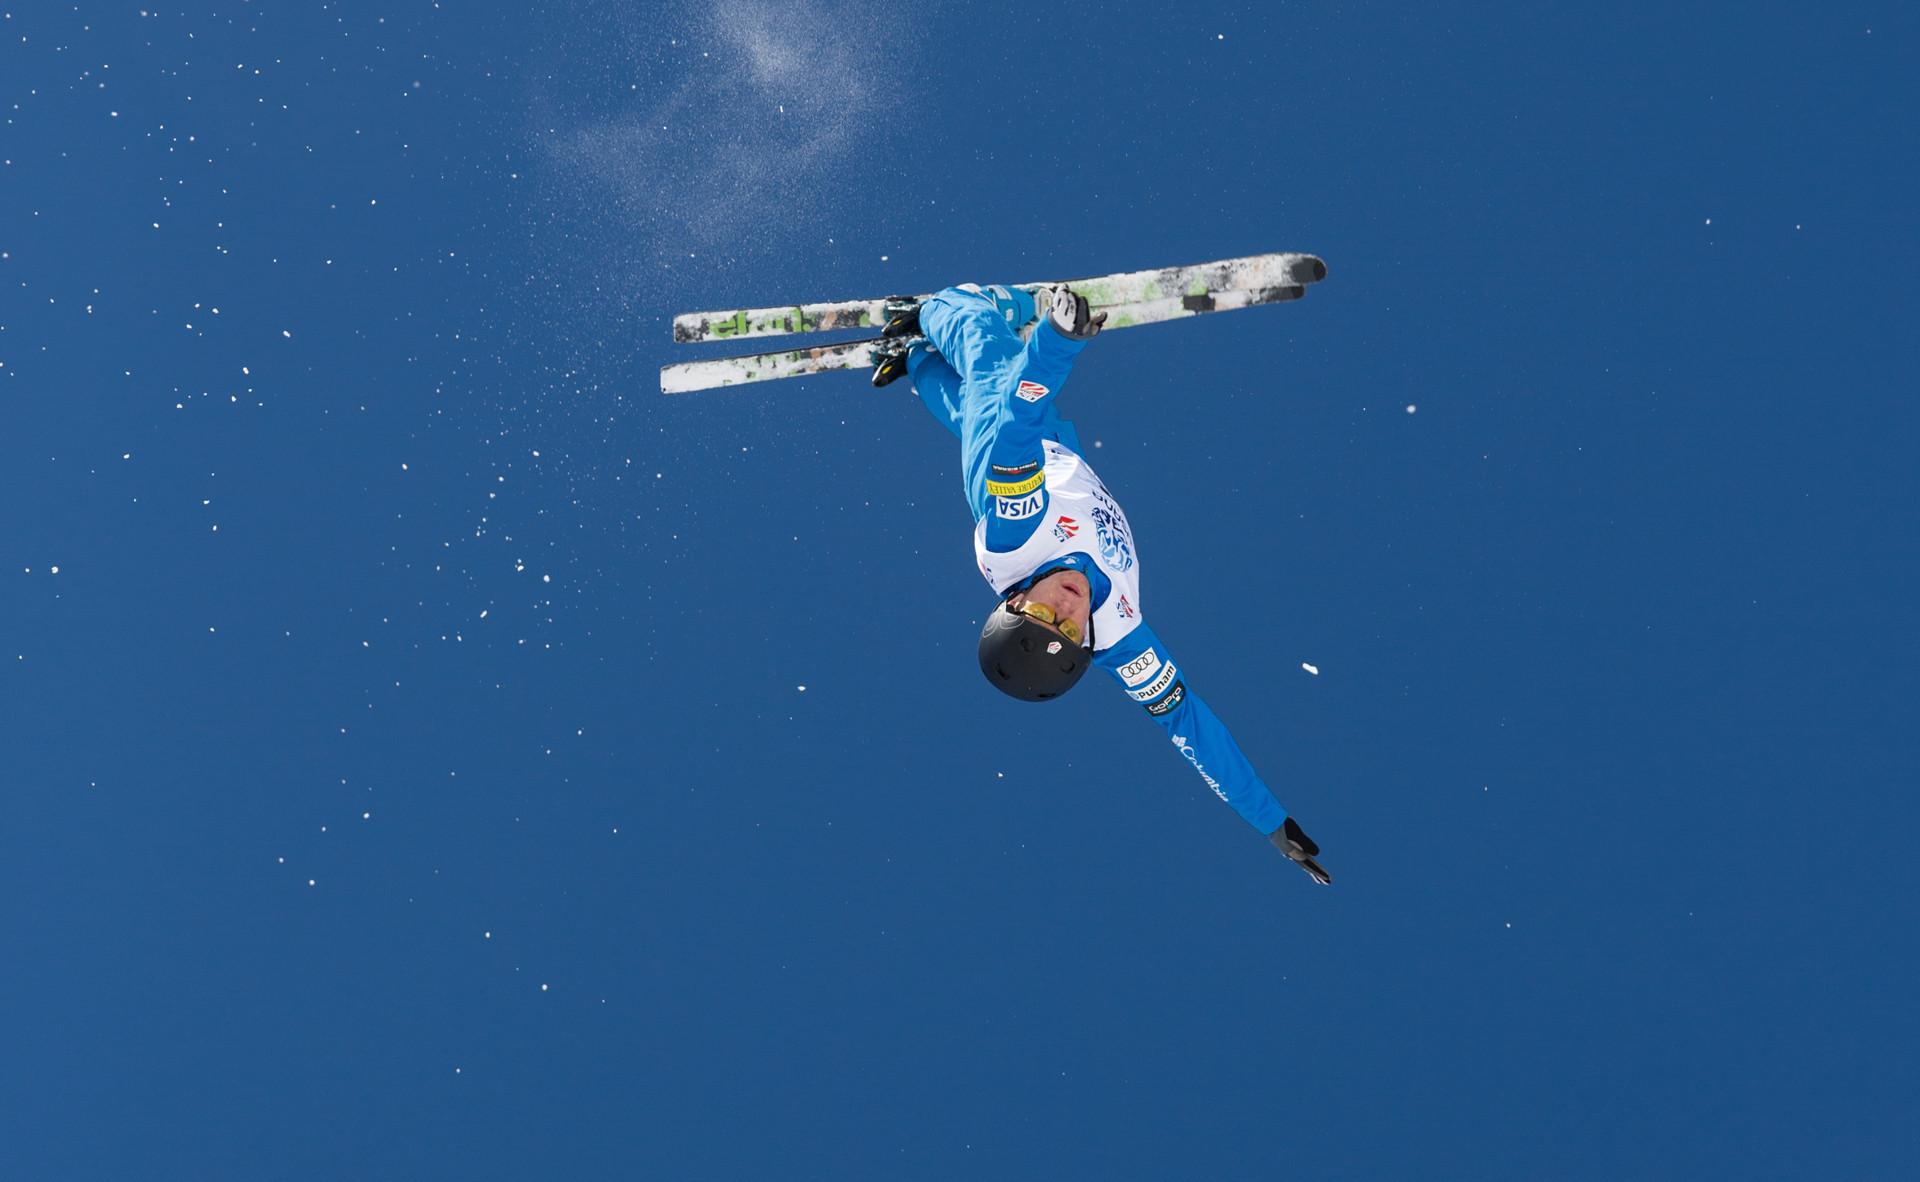 Bristol Mountain skiier Chris Lillis won at the 2019 US Aerial Freestyle Championships ©USSA